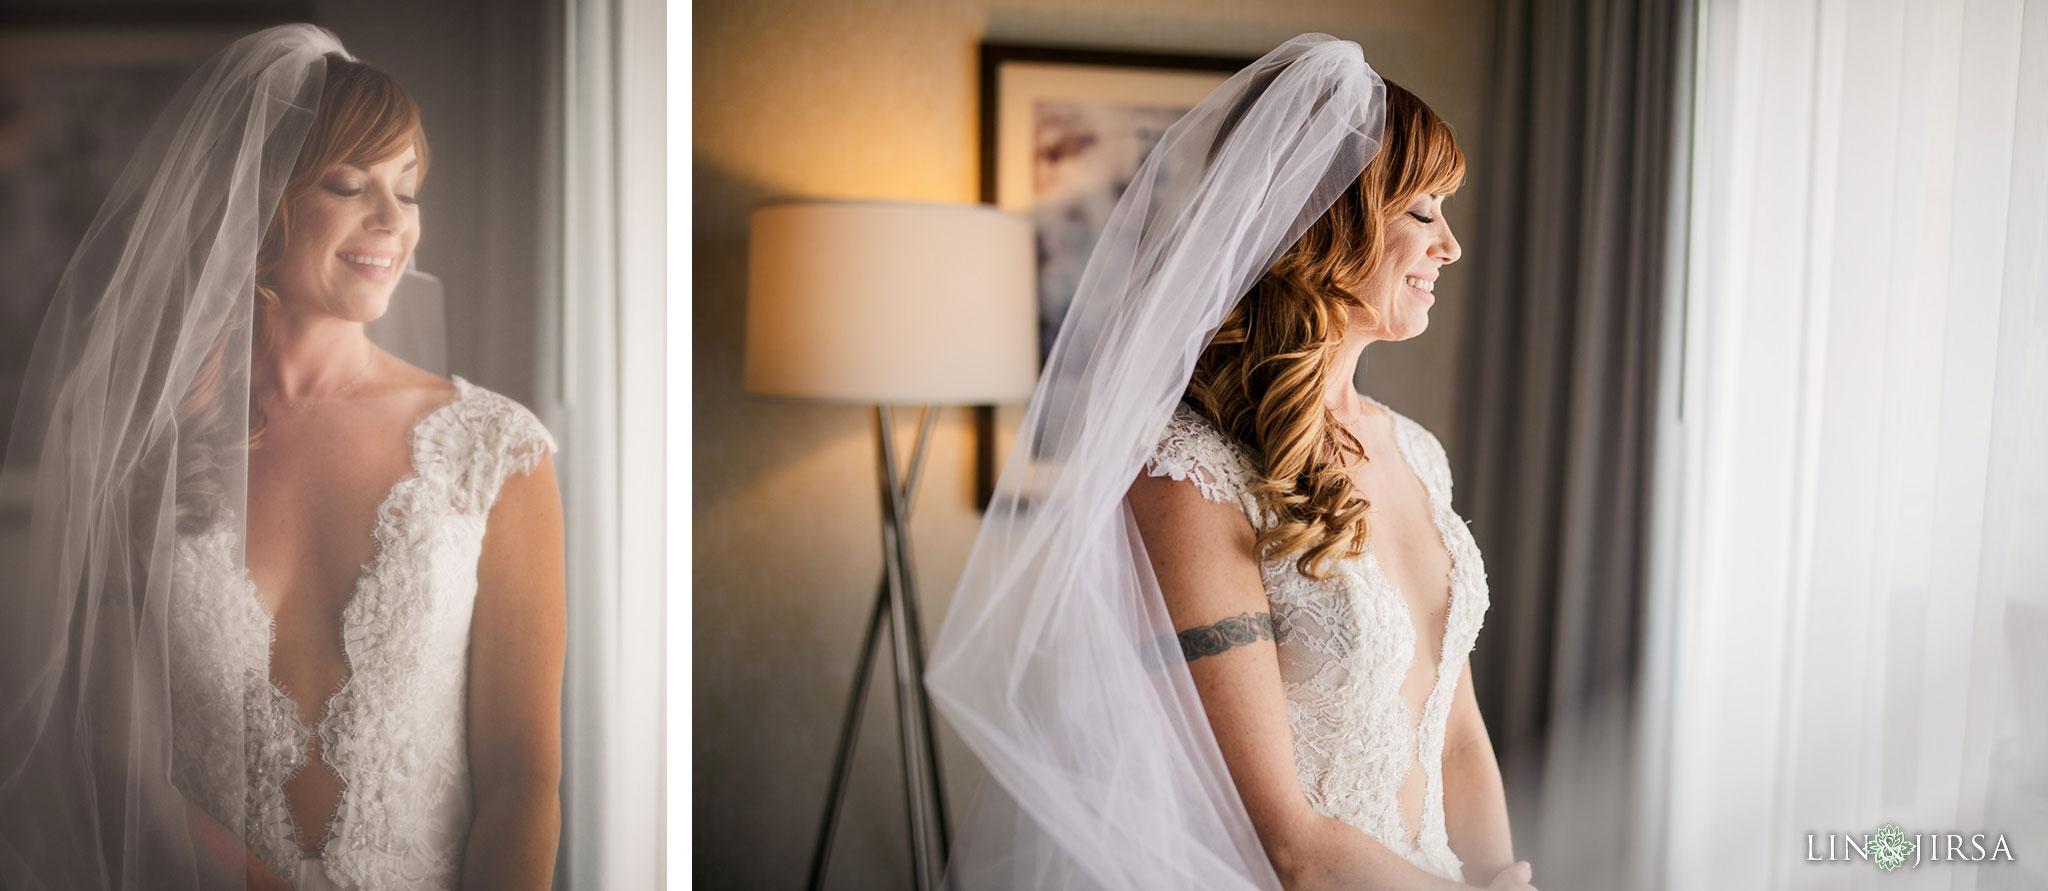 004 marina del rey hotel wedding photography